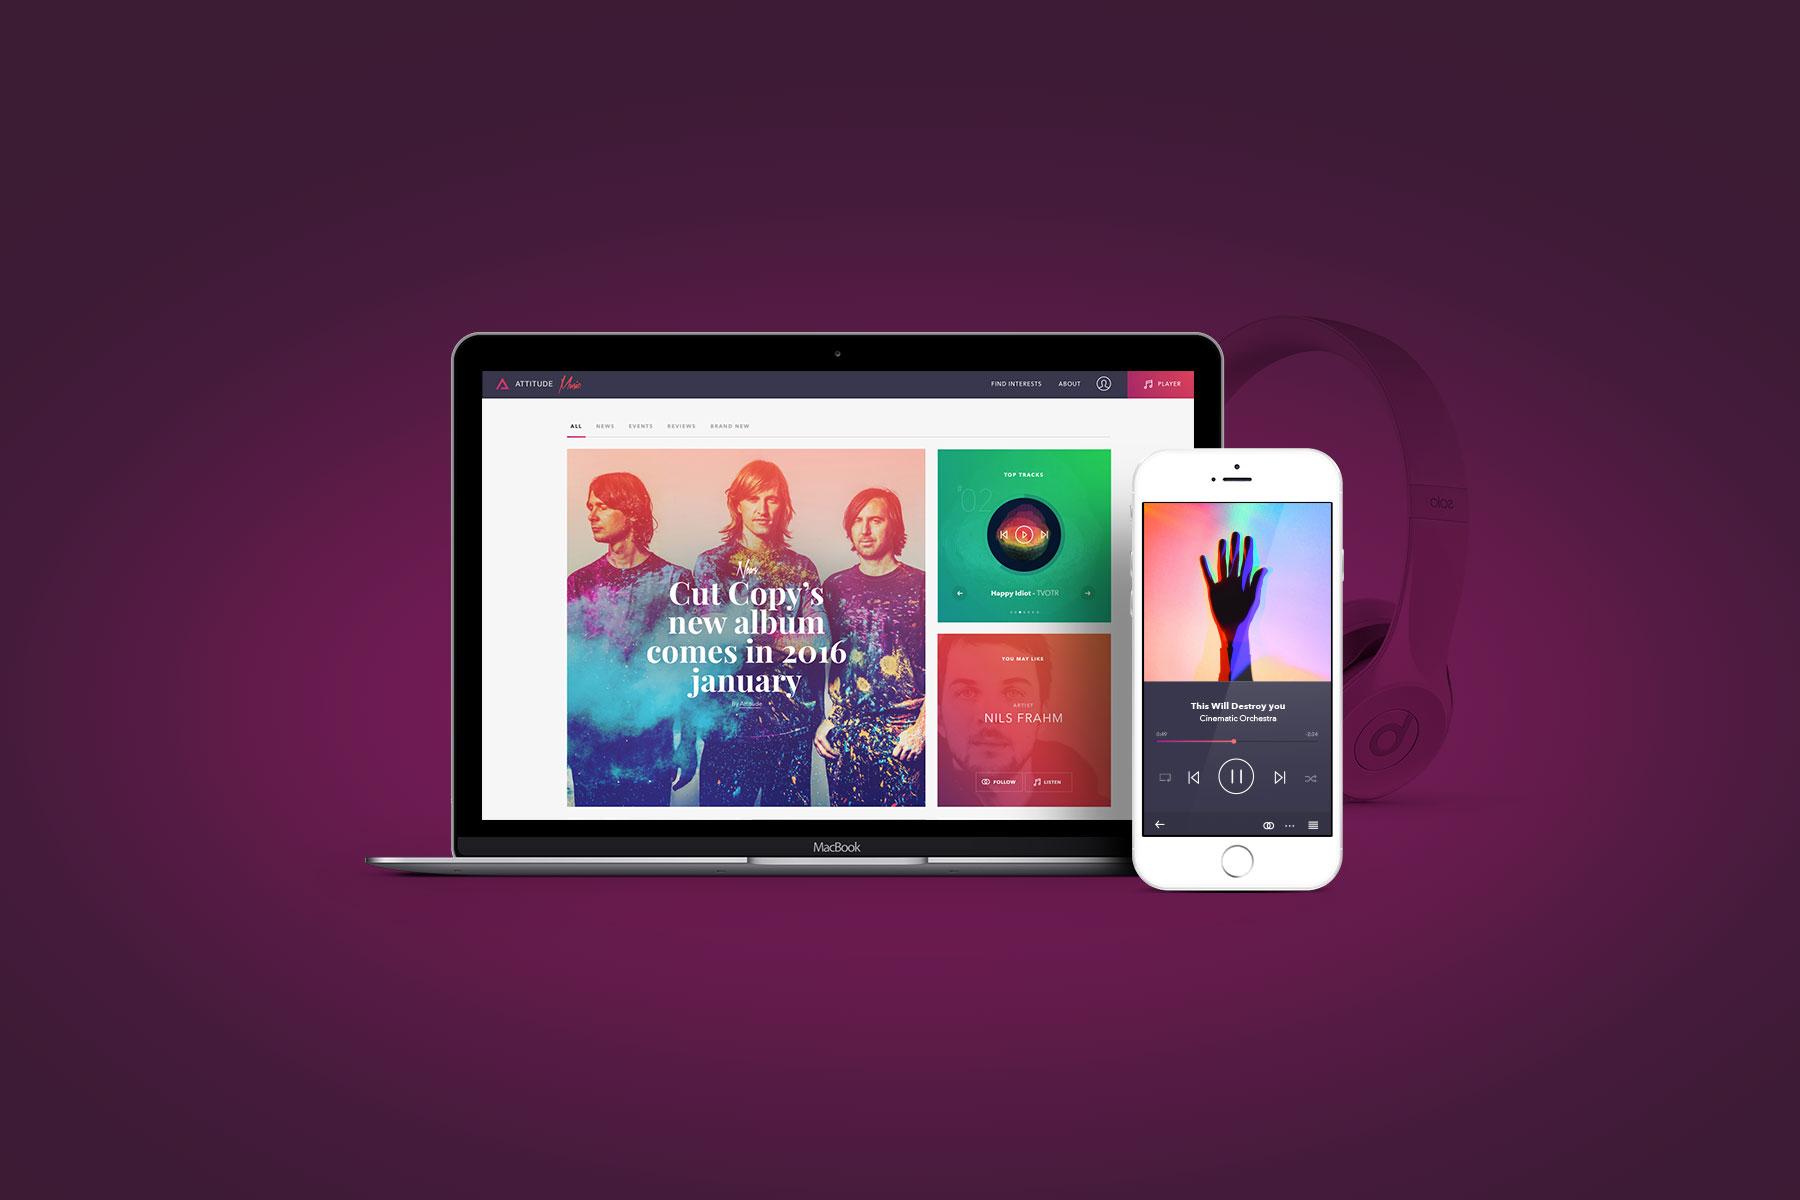 Smart music platform